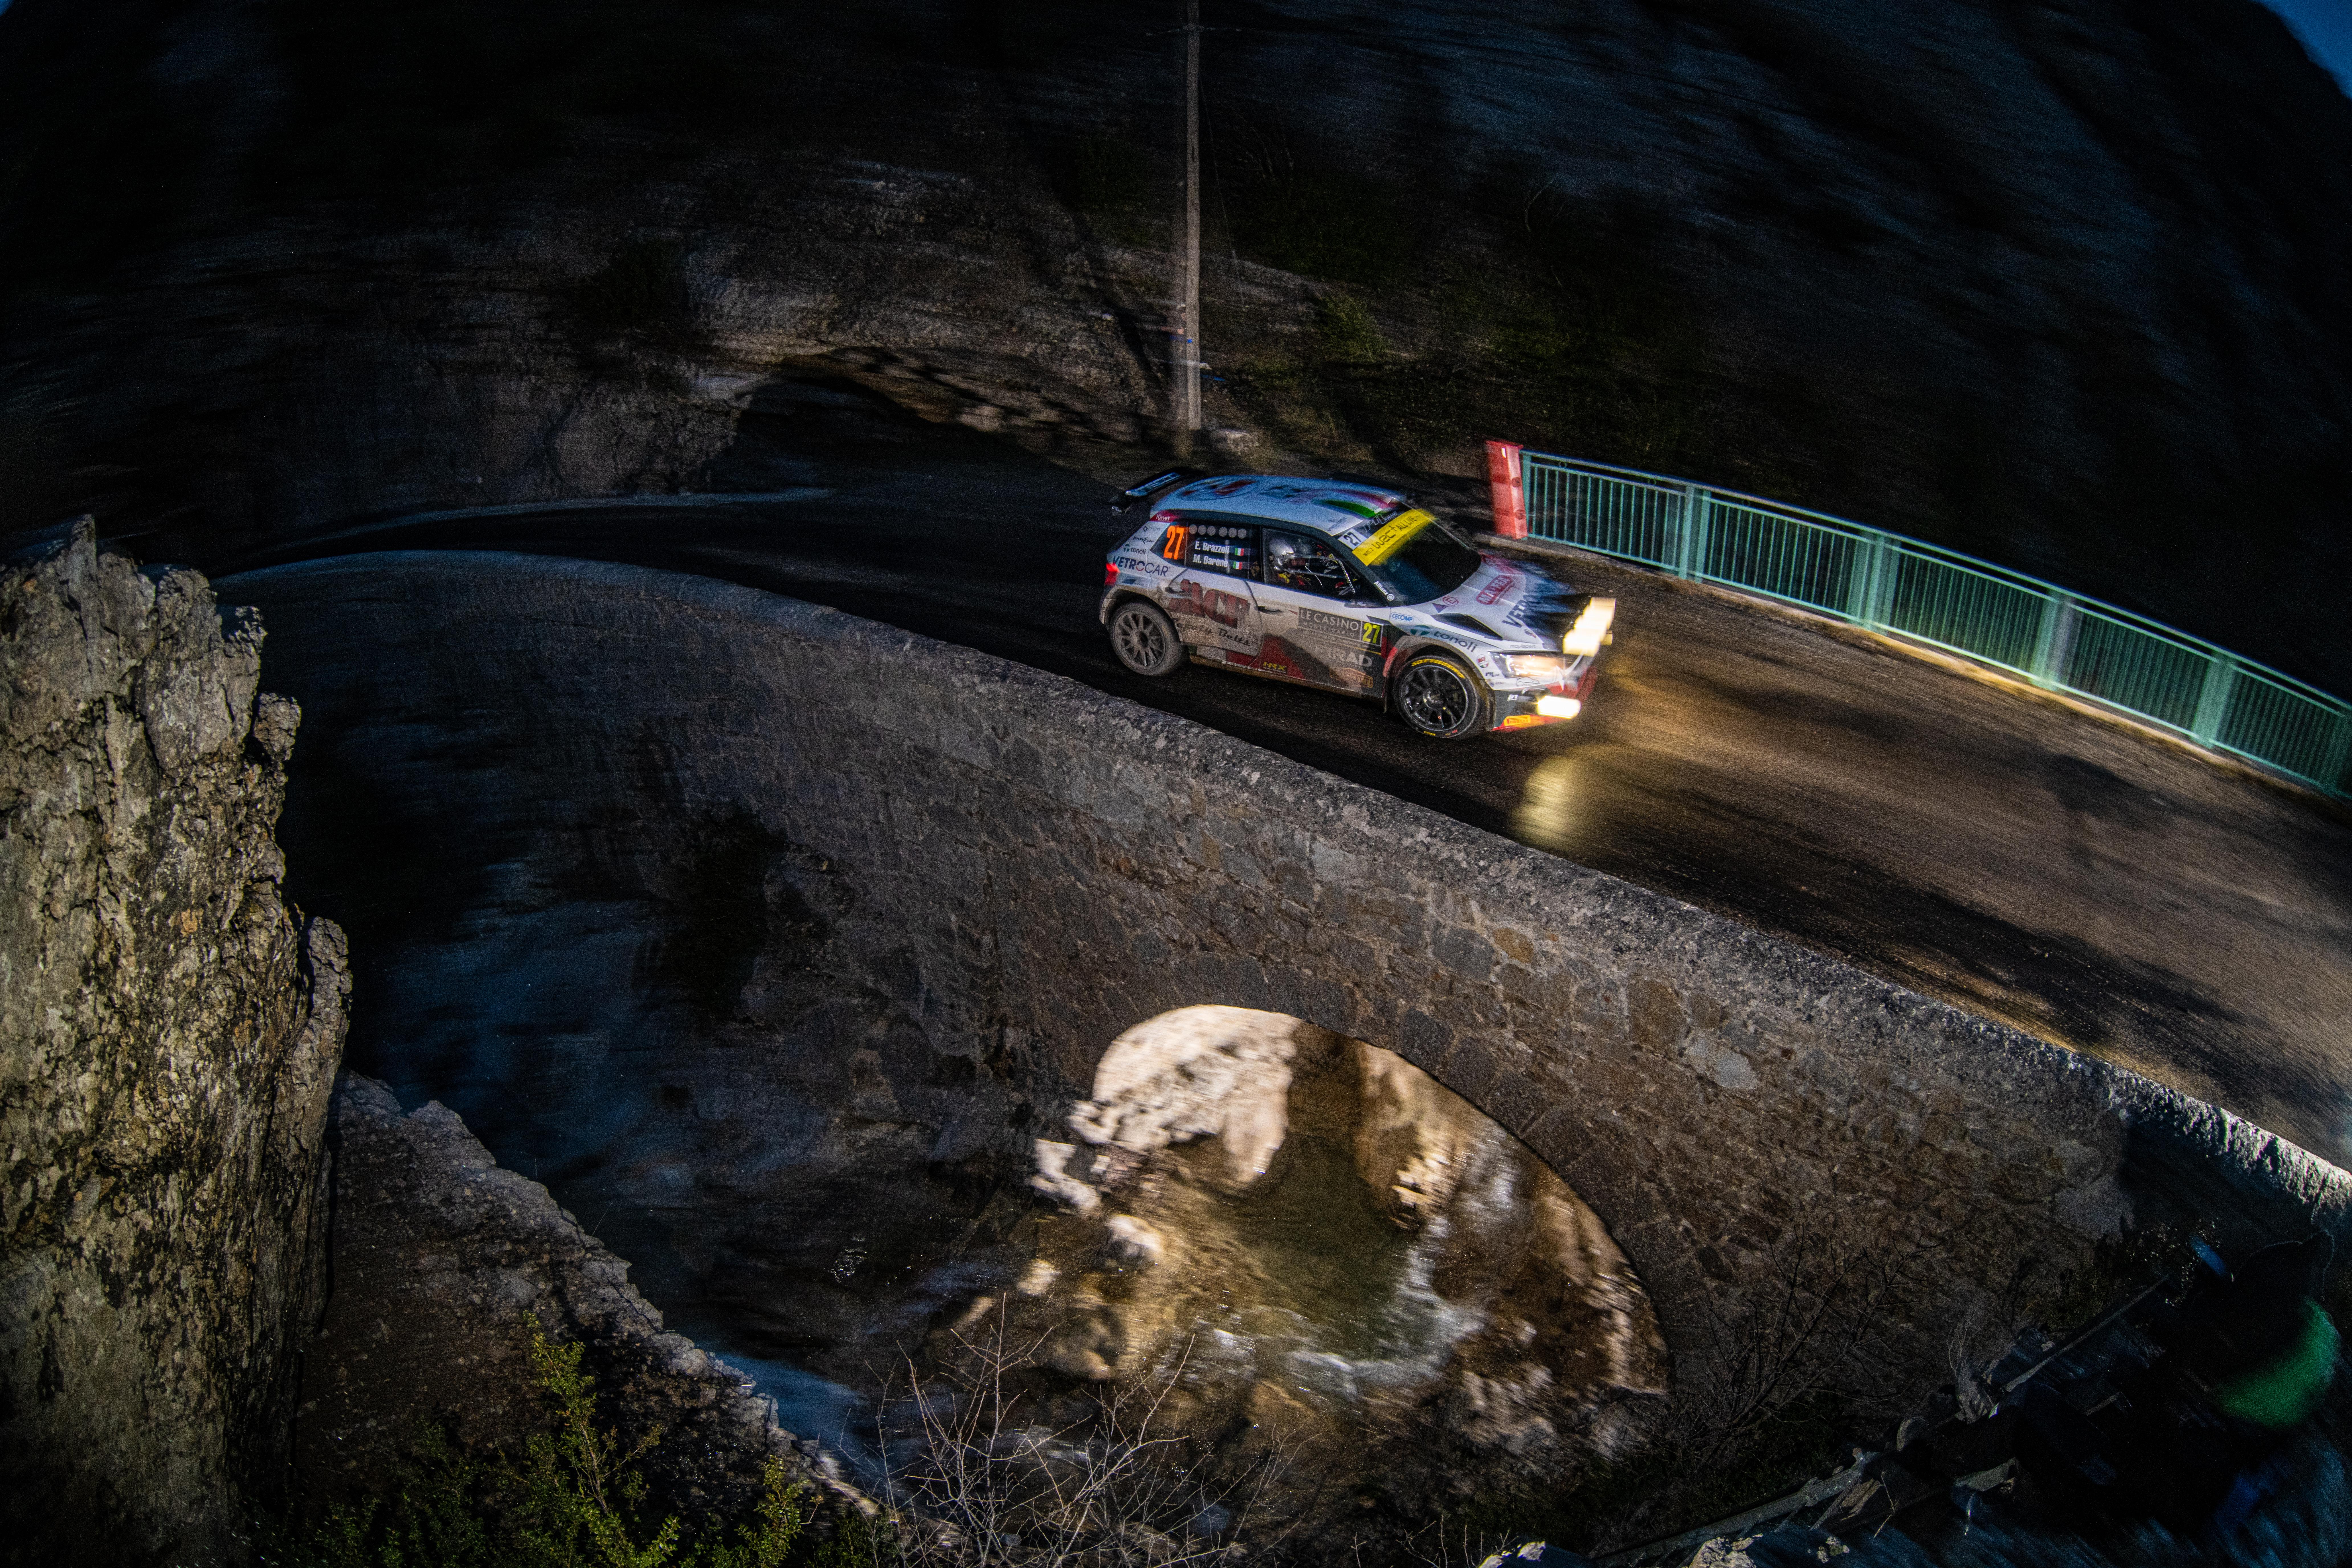 Rallye Monte-Carlo: SKODA FABIA Rally2 evo driver Mikkelsen starts as WRC2 leader into last leg - Image 5